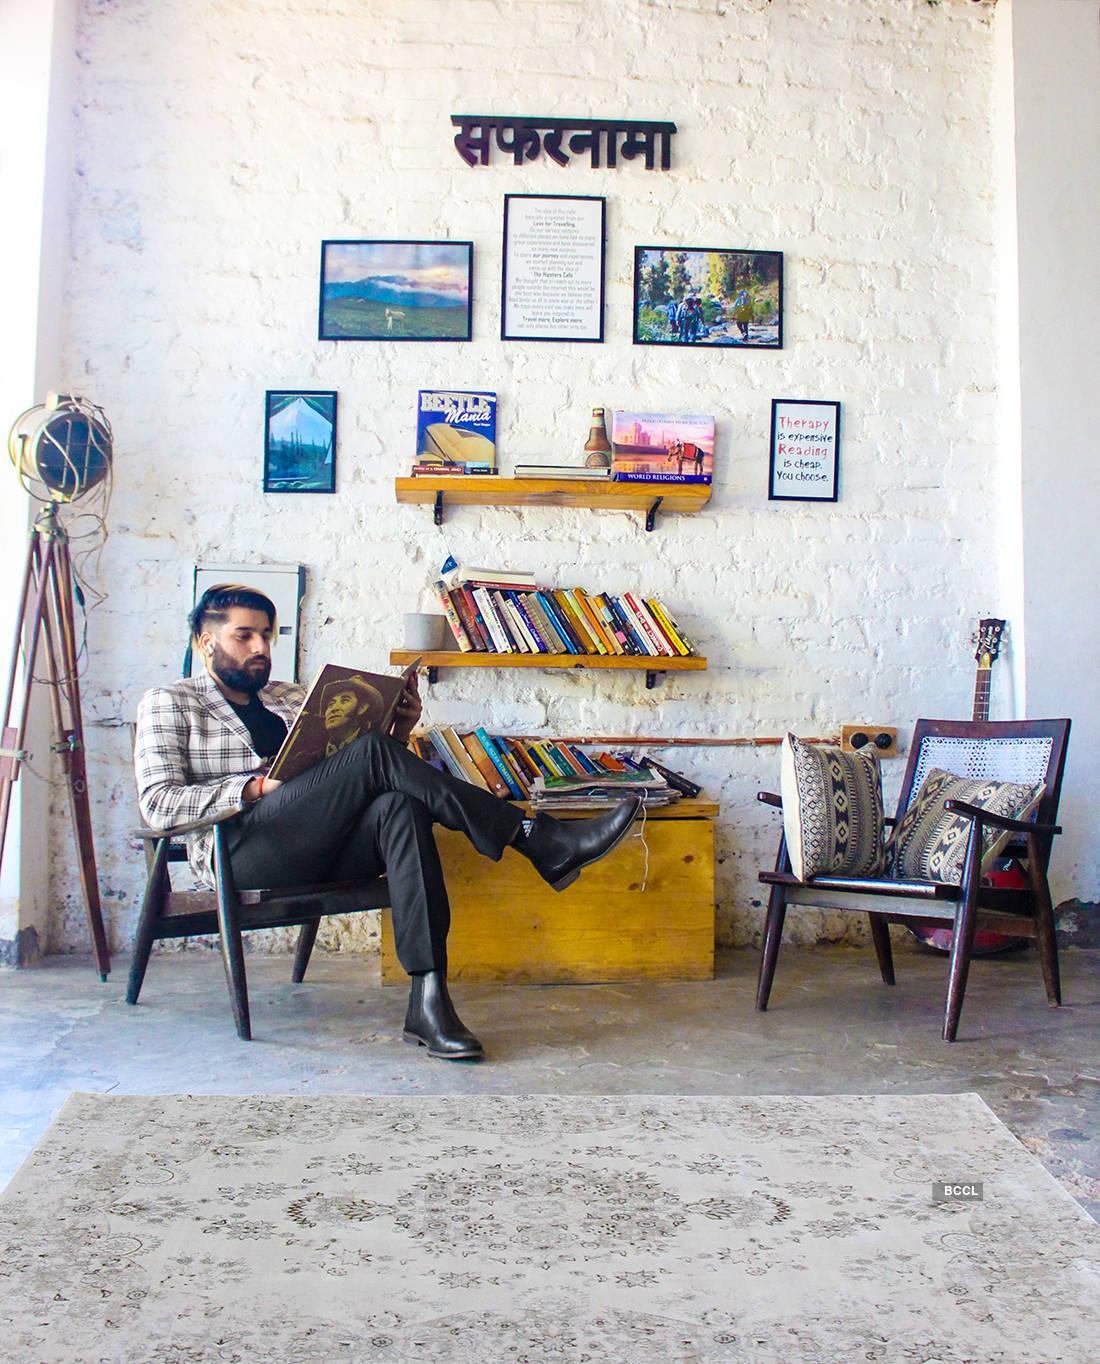 Meet Abhinav Bhardwaj who's living life in an extraordinary way...